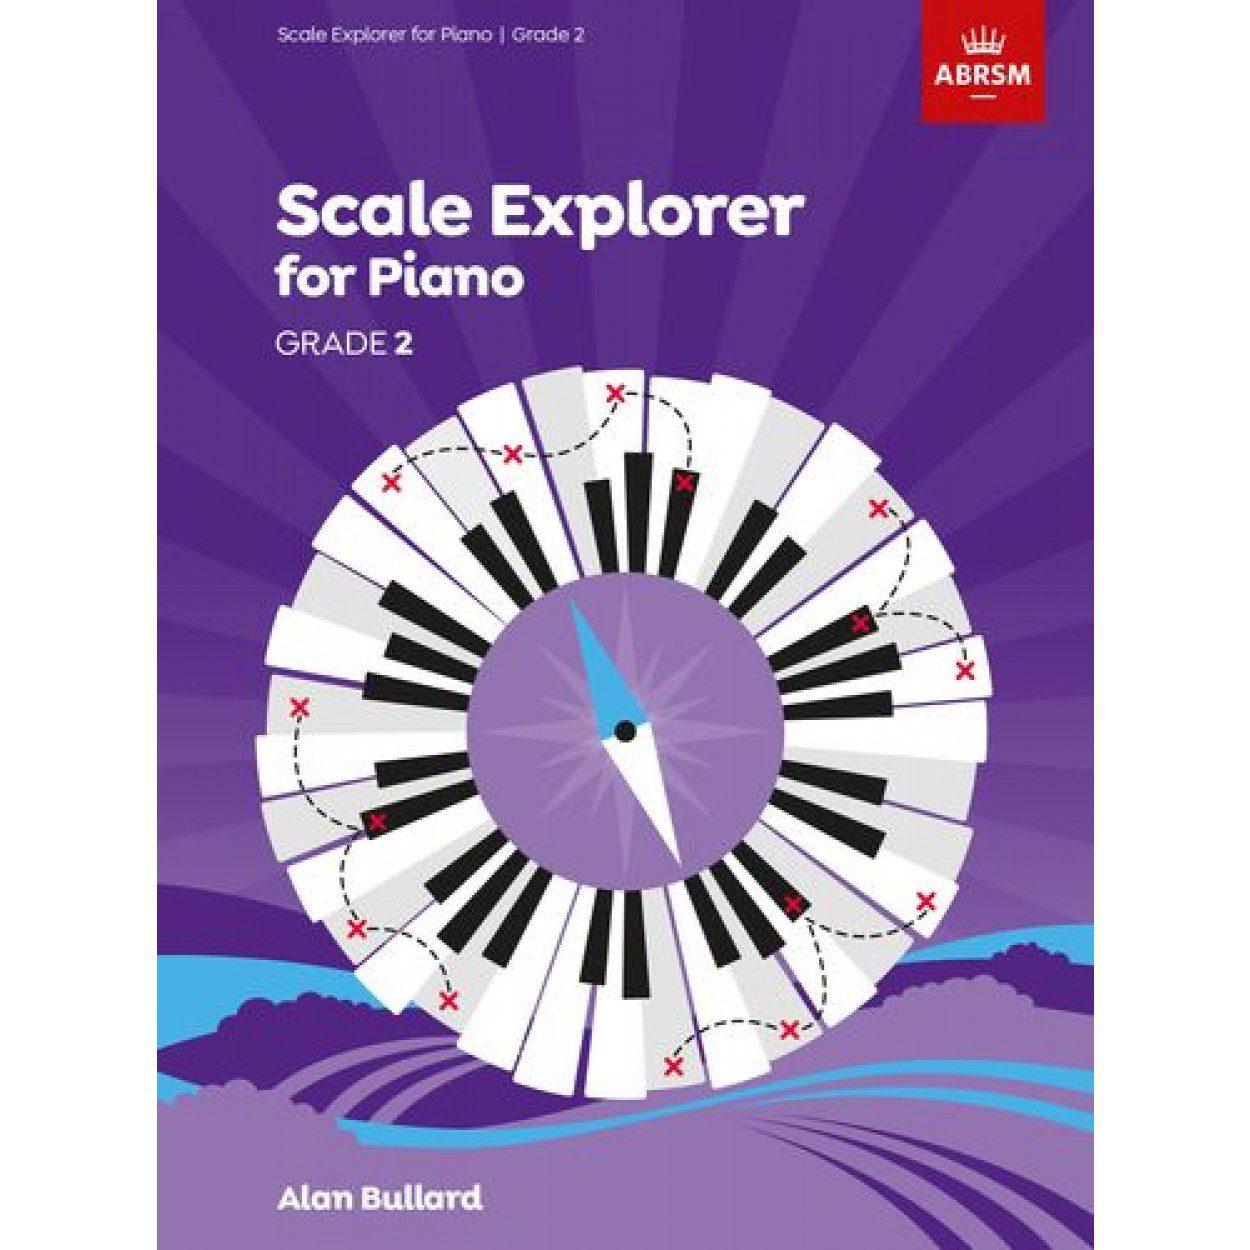 Scale Explorer for Piano Grade 2 available at Penarth Music Centre